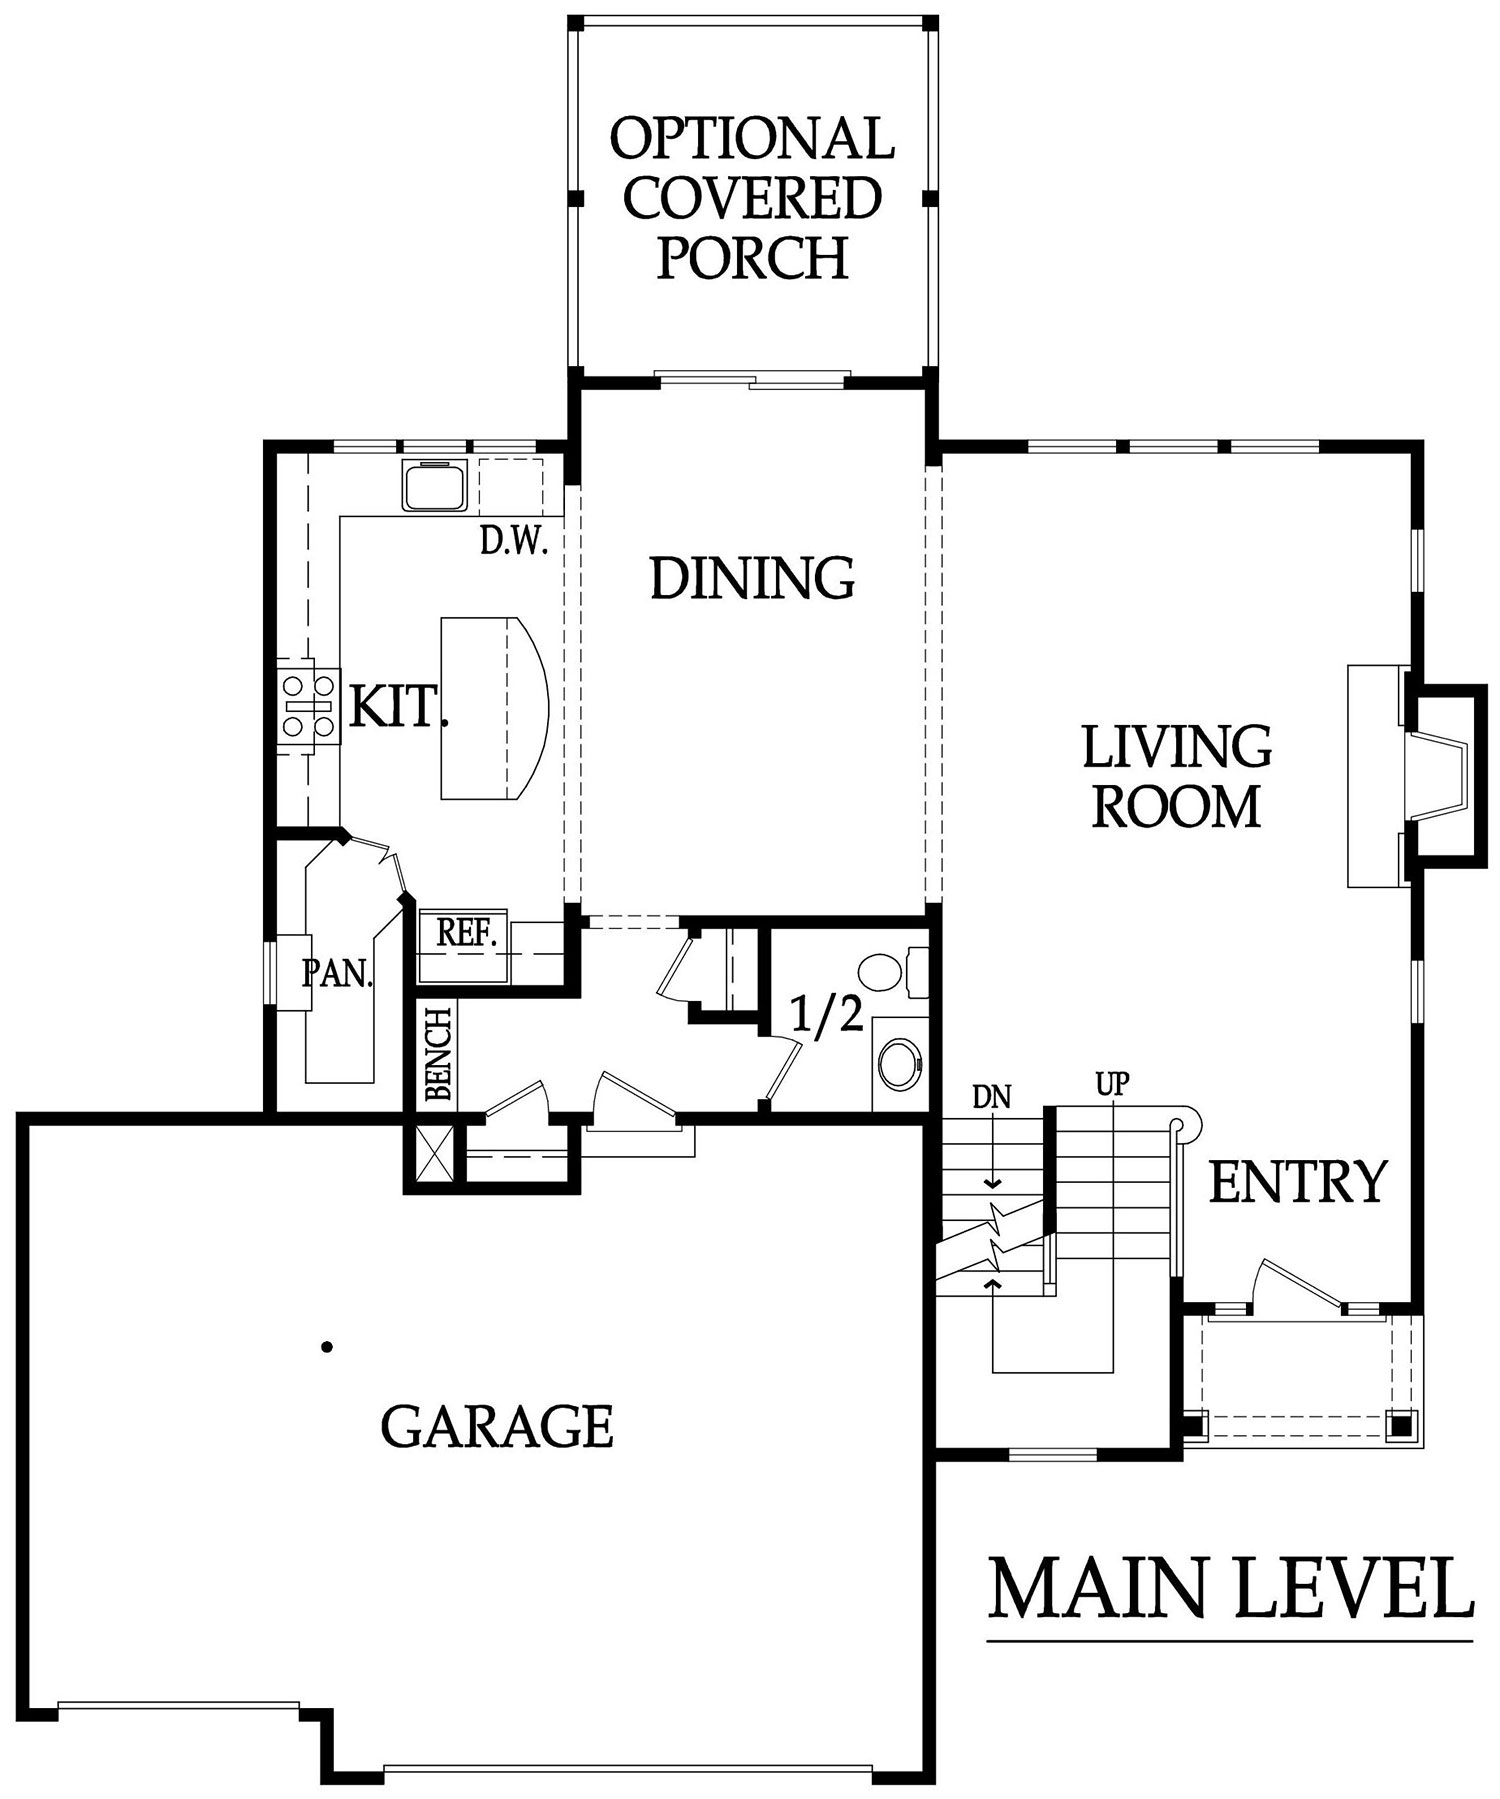 Destin main level rendering